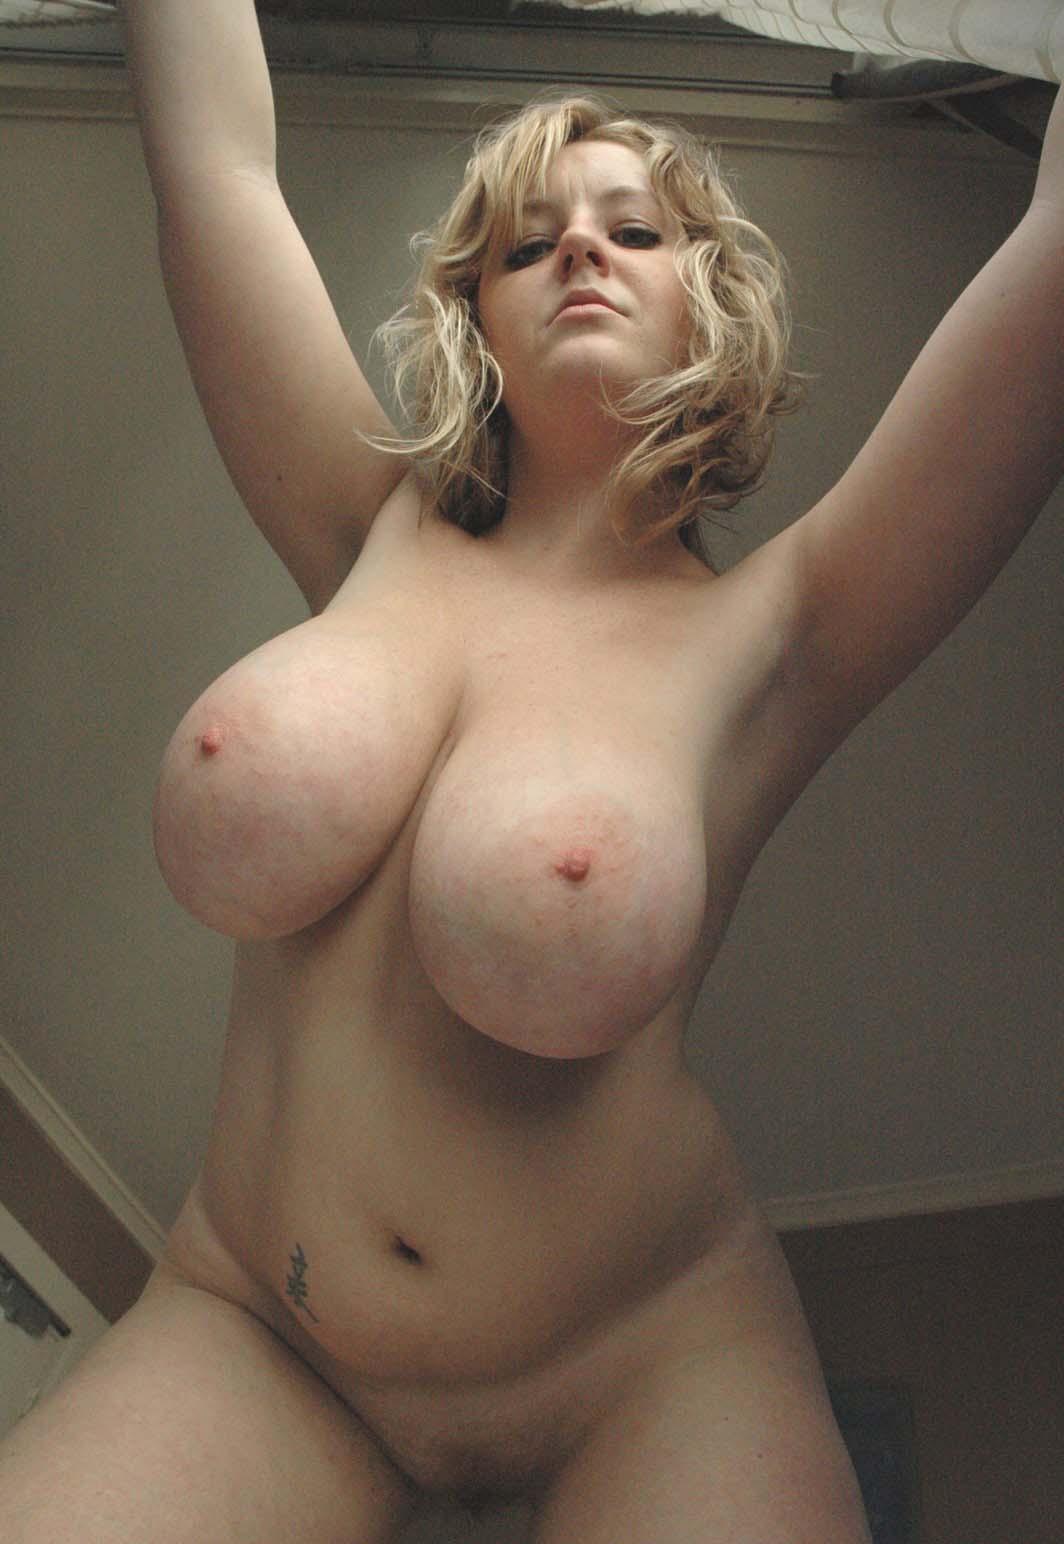 Japanese nude mom pics